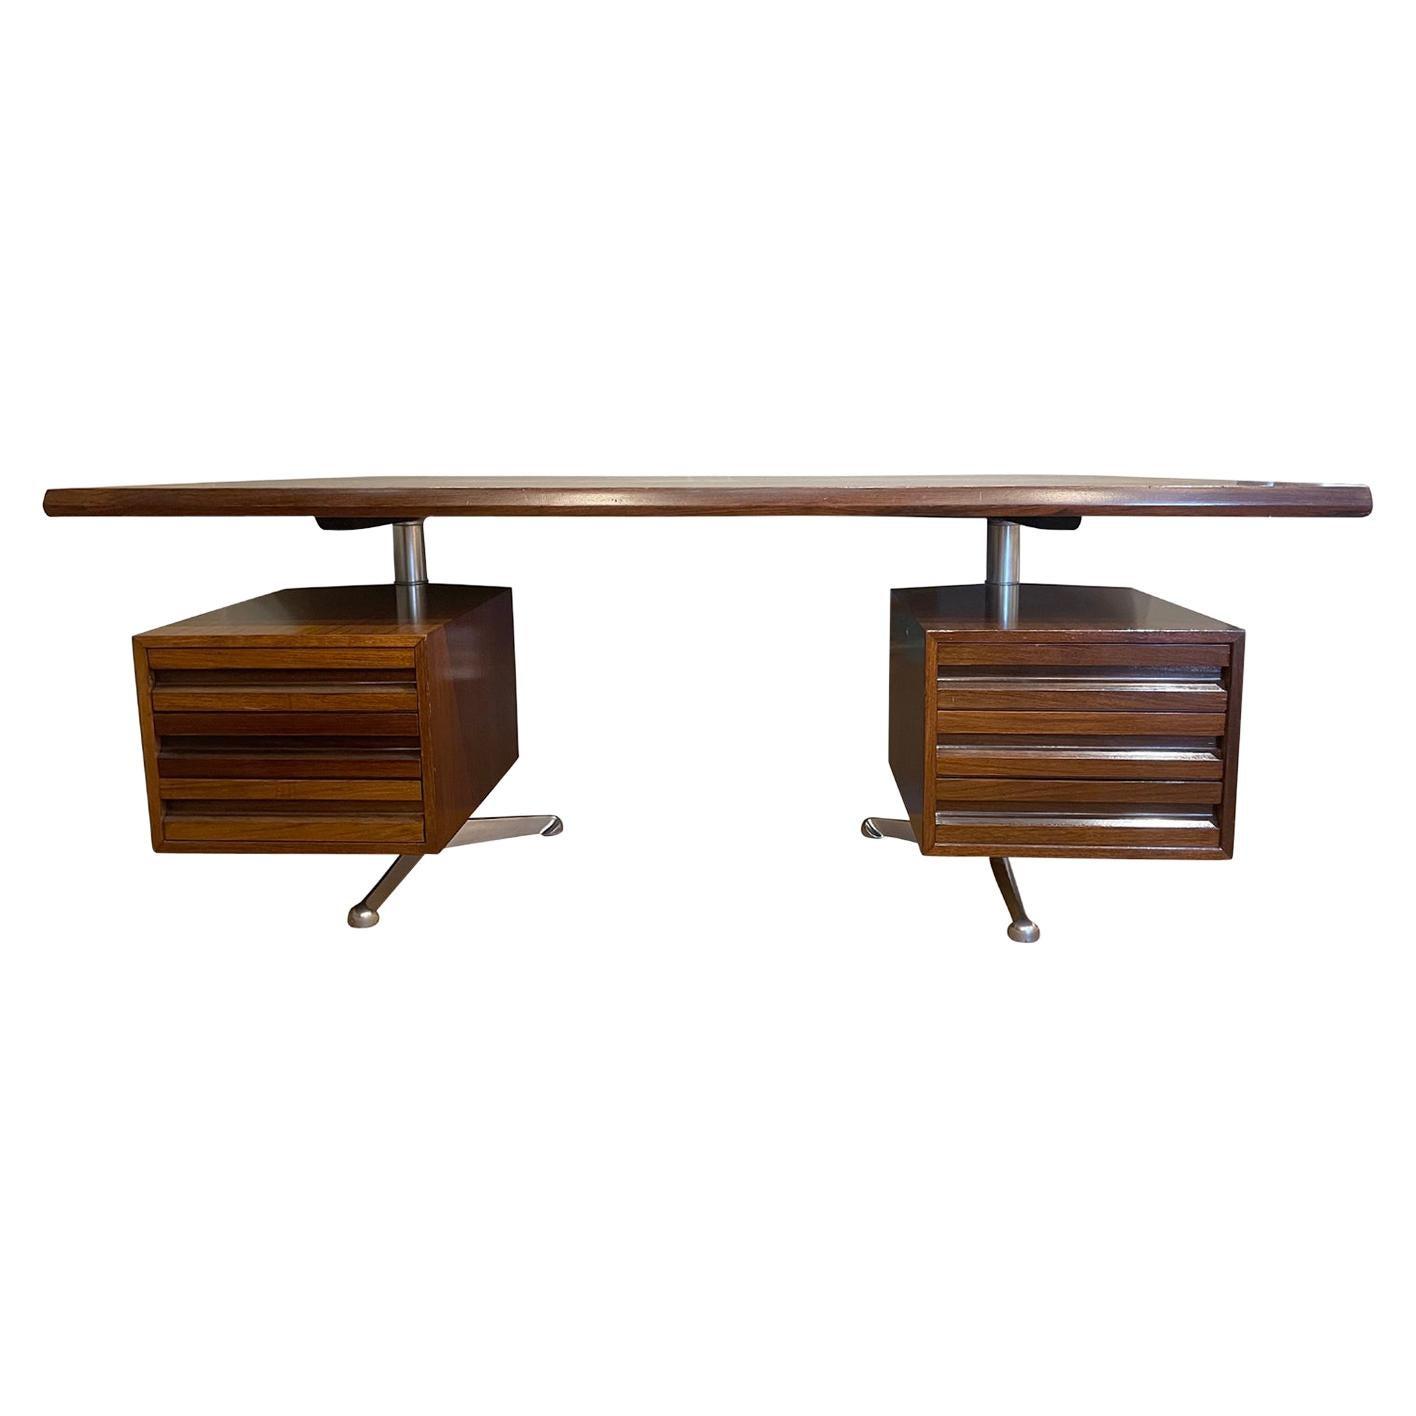 20th Century Italian Tecno Rosewood Writing Table, Desk by Osvaldo Borsani